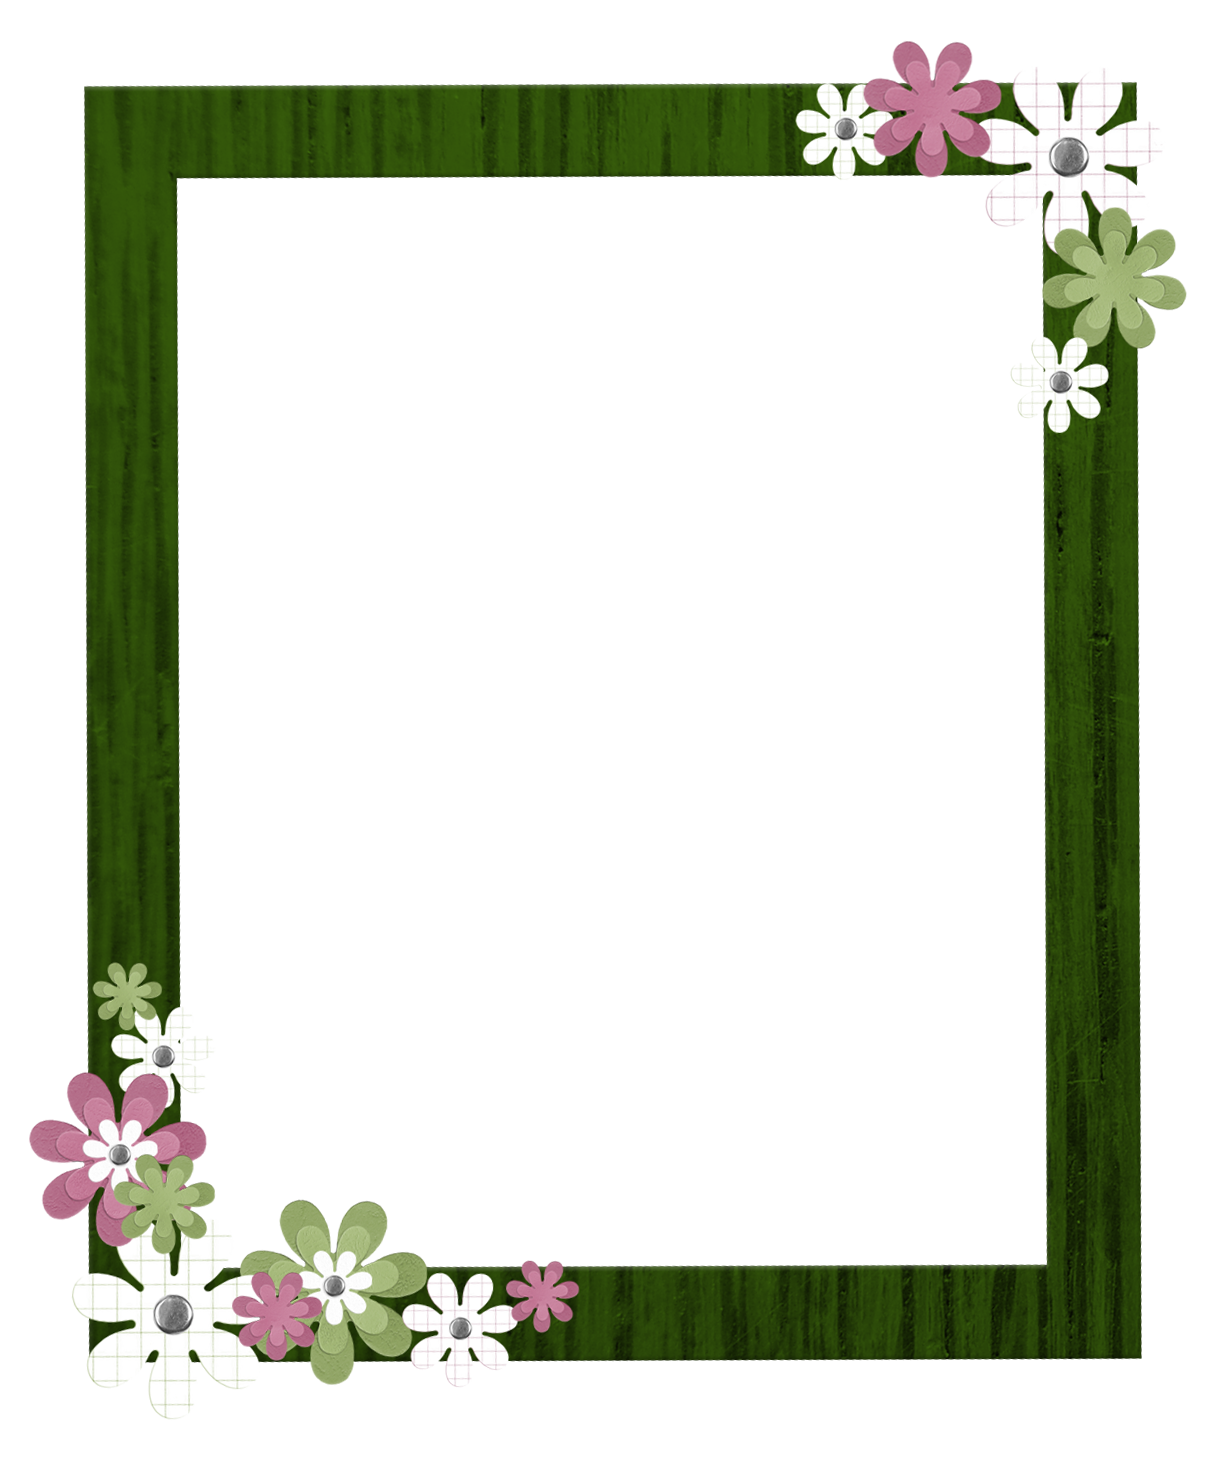 Border clipart mart. Green frame png